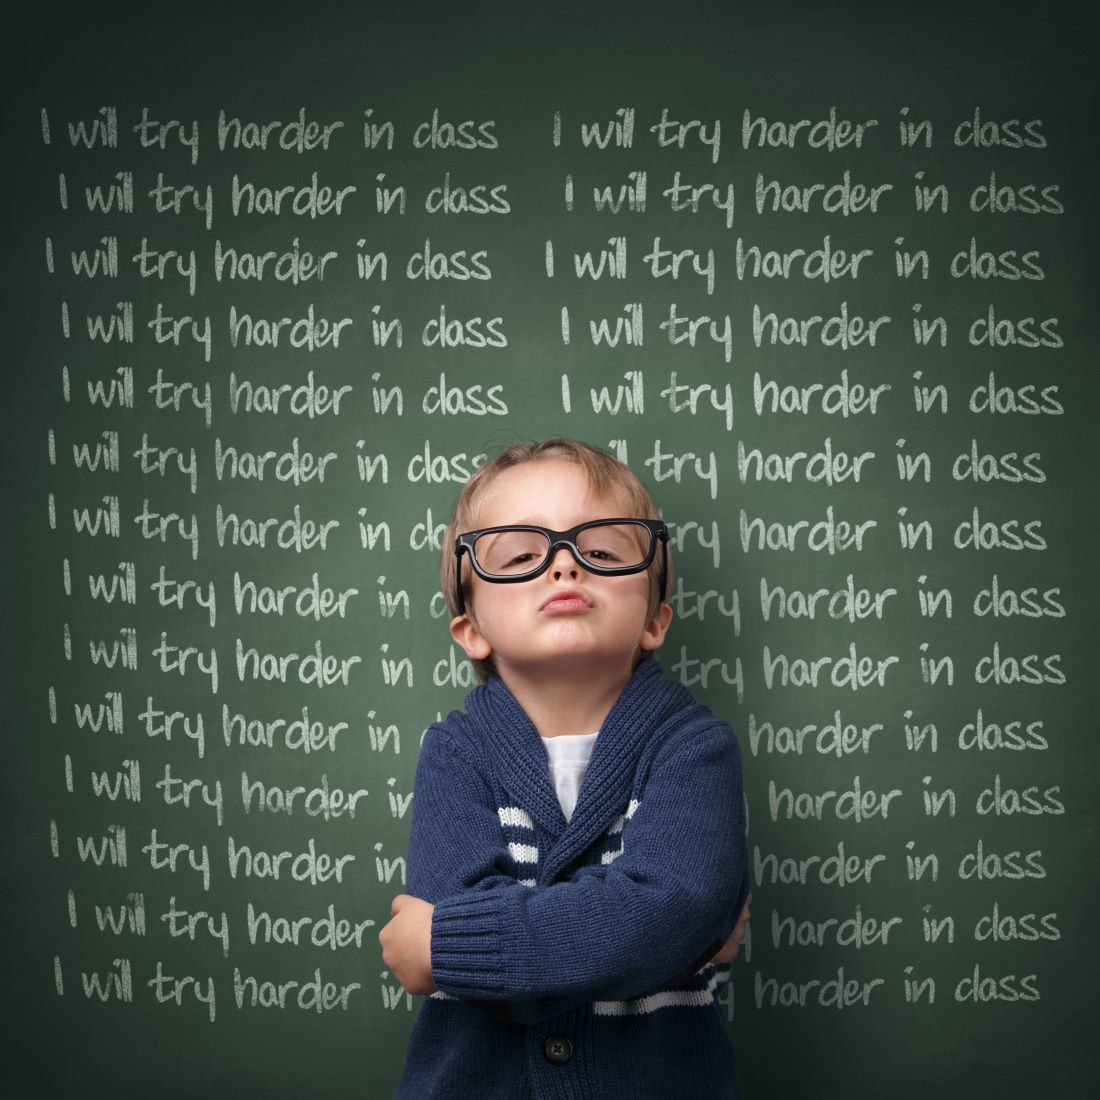 A schoolboy writing lines